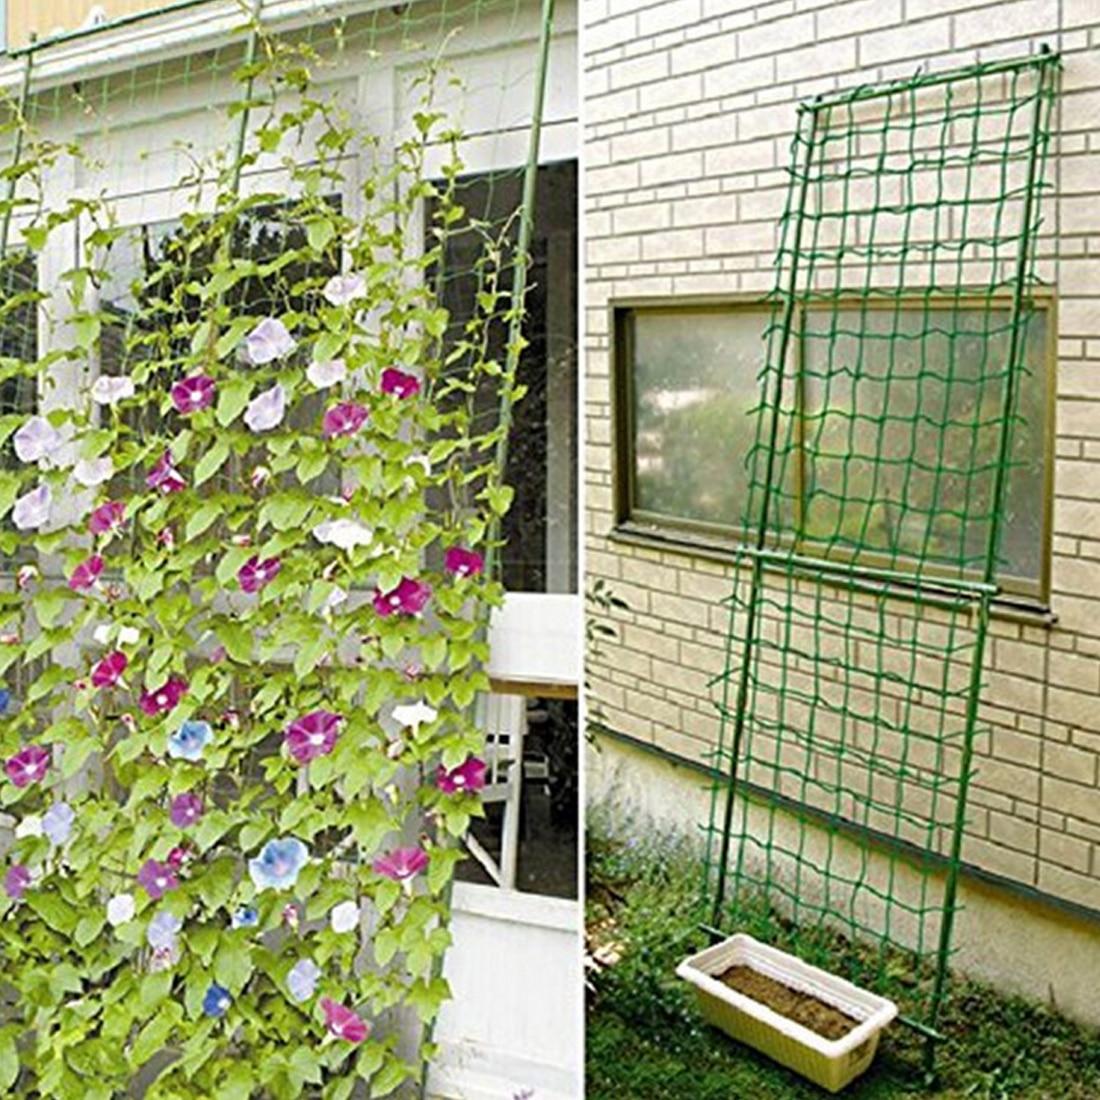 Garden Green Nylon Trellis Netting Support Climbing Bean Plant Nets Grow FenceXJ